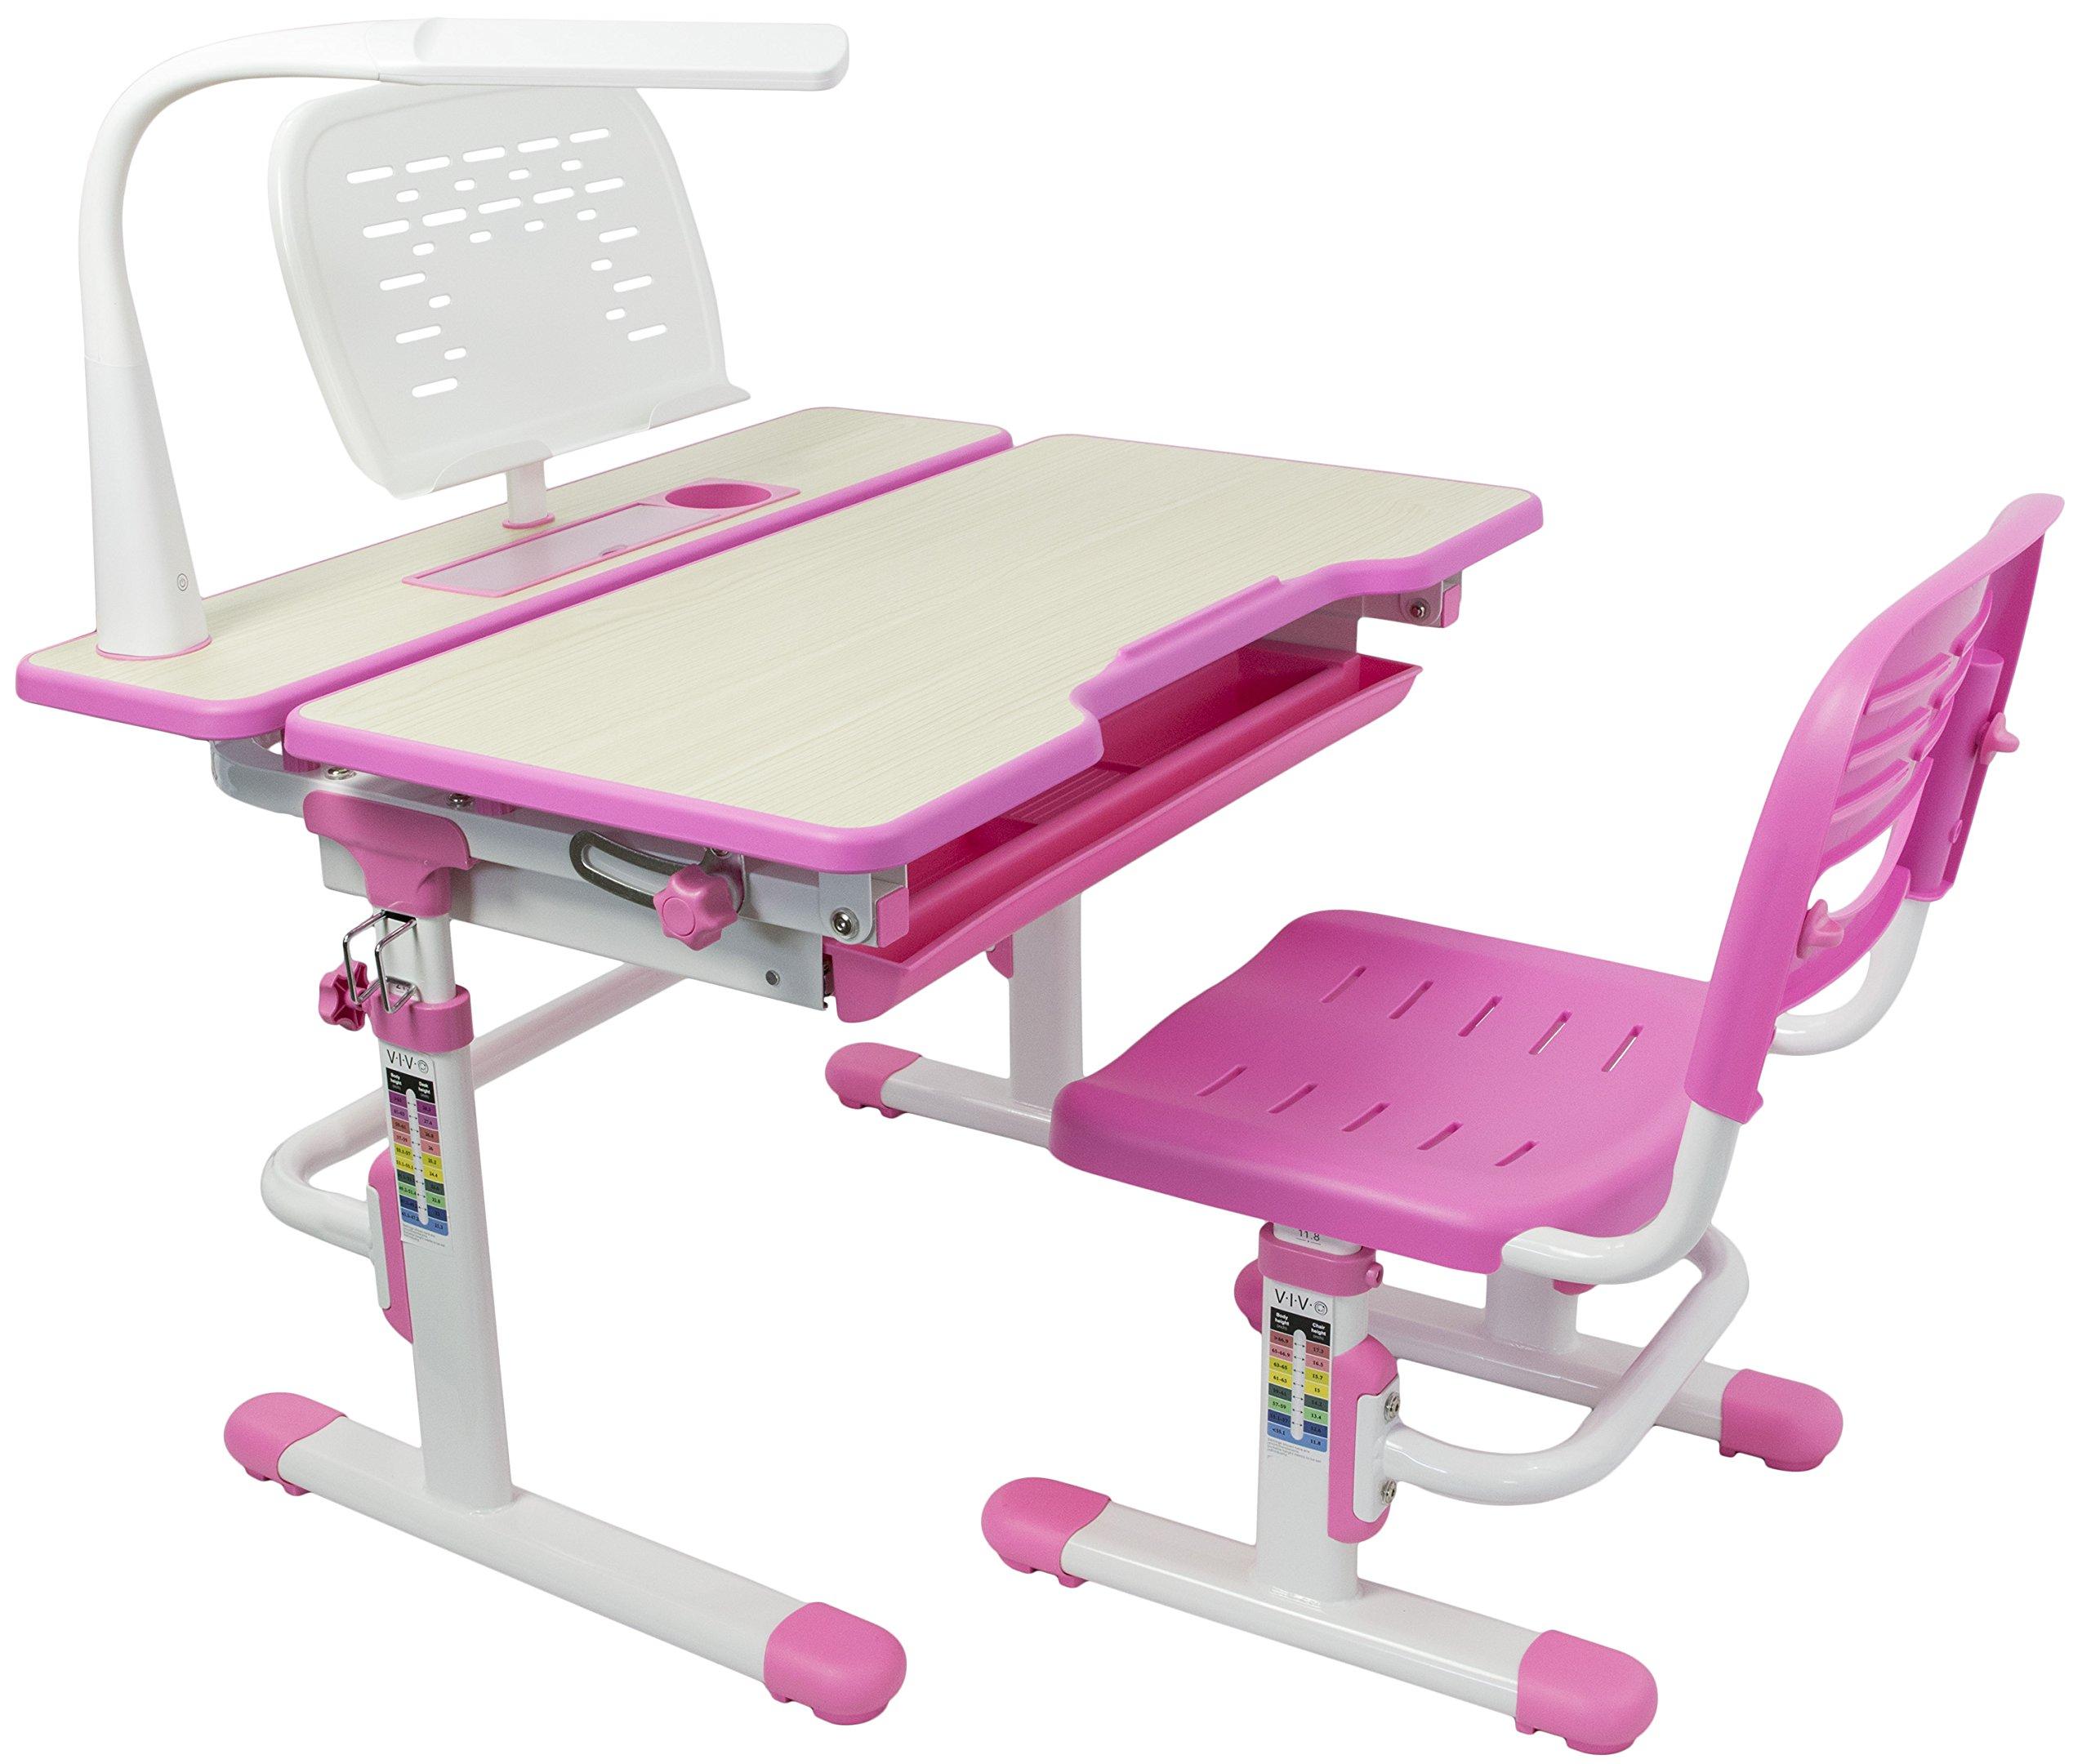 VIVO Deluxe Height Adjustable Children's Desk & Chair Kids Interactive Work Station Pink (DESK-V402P)